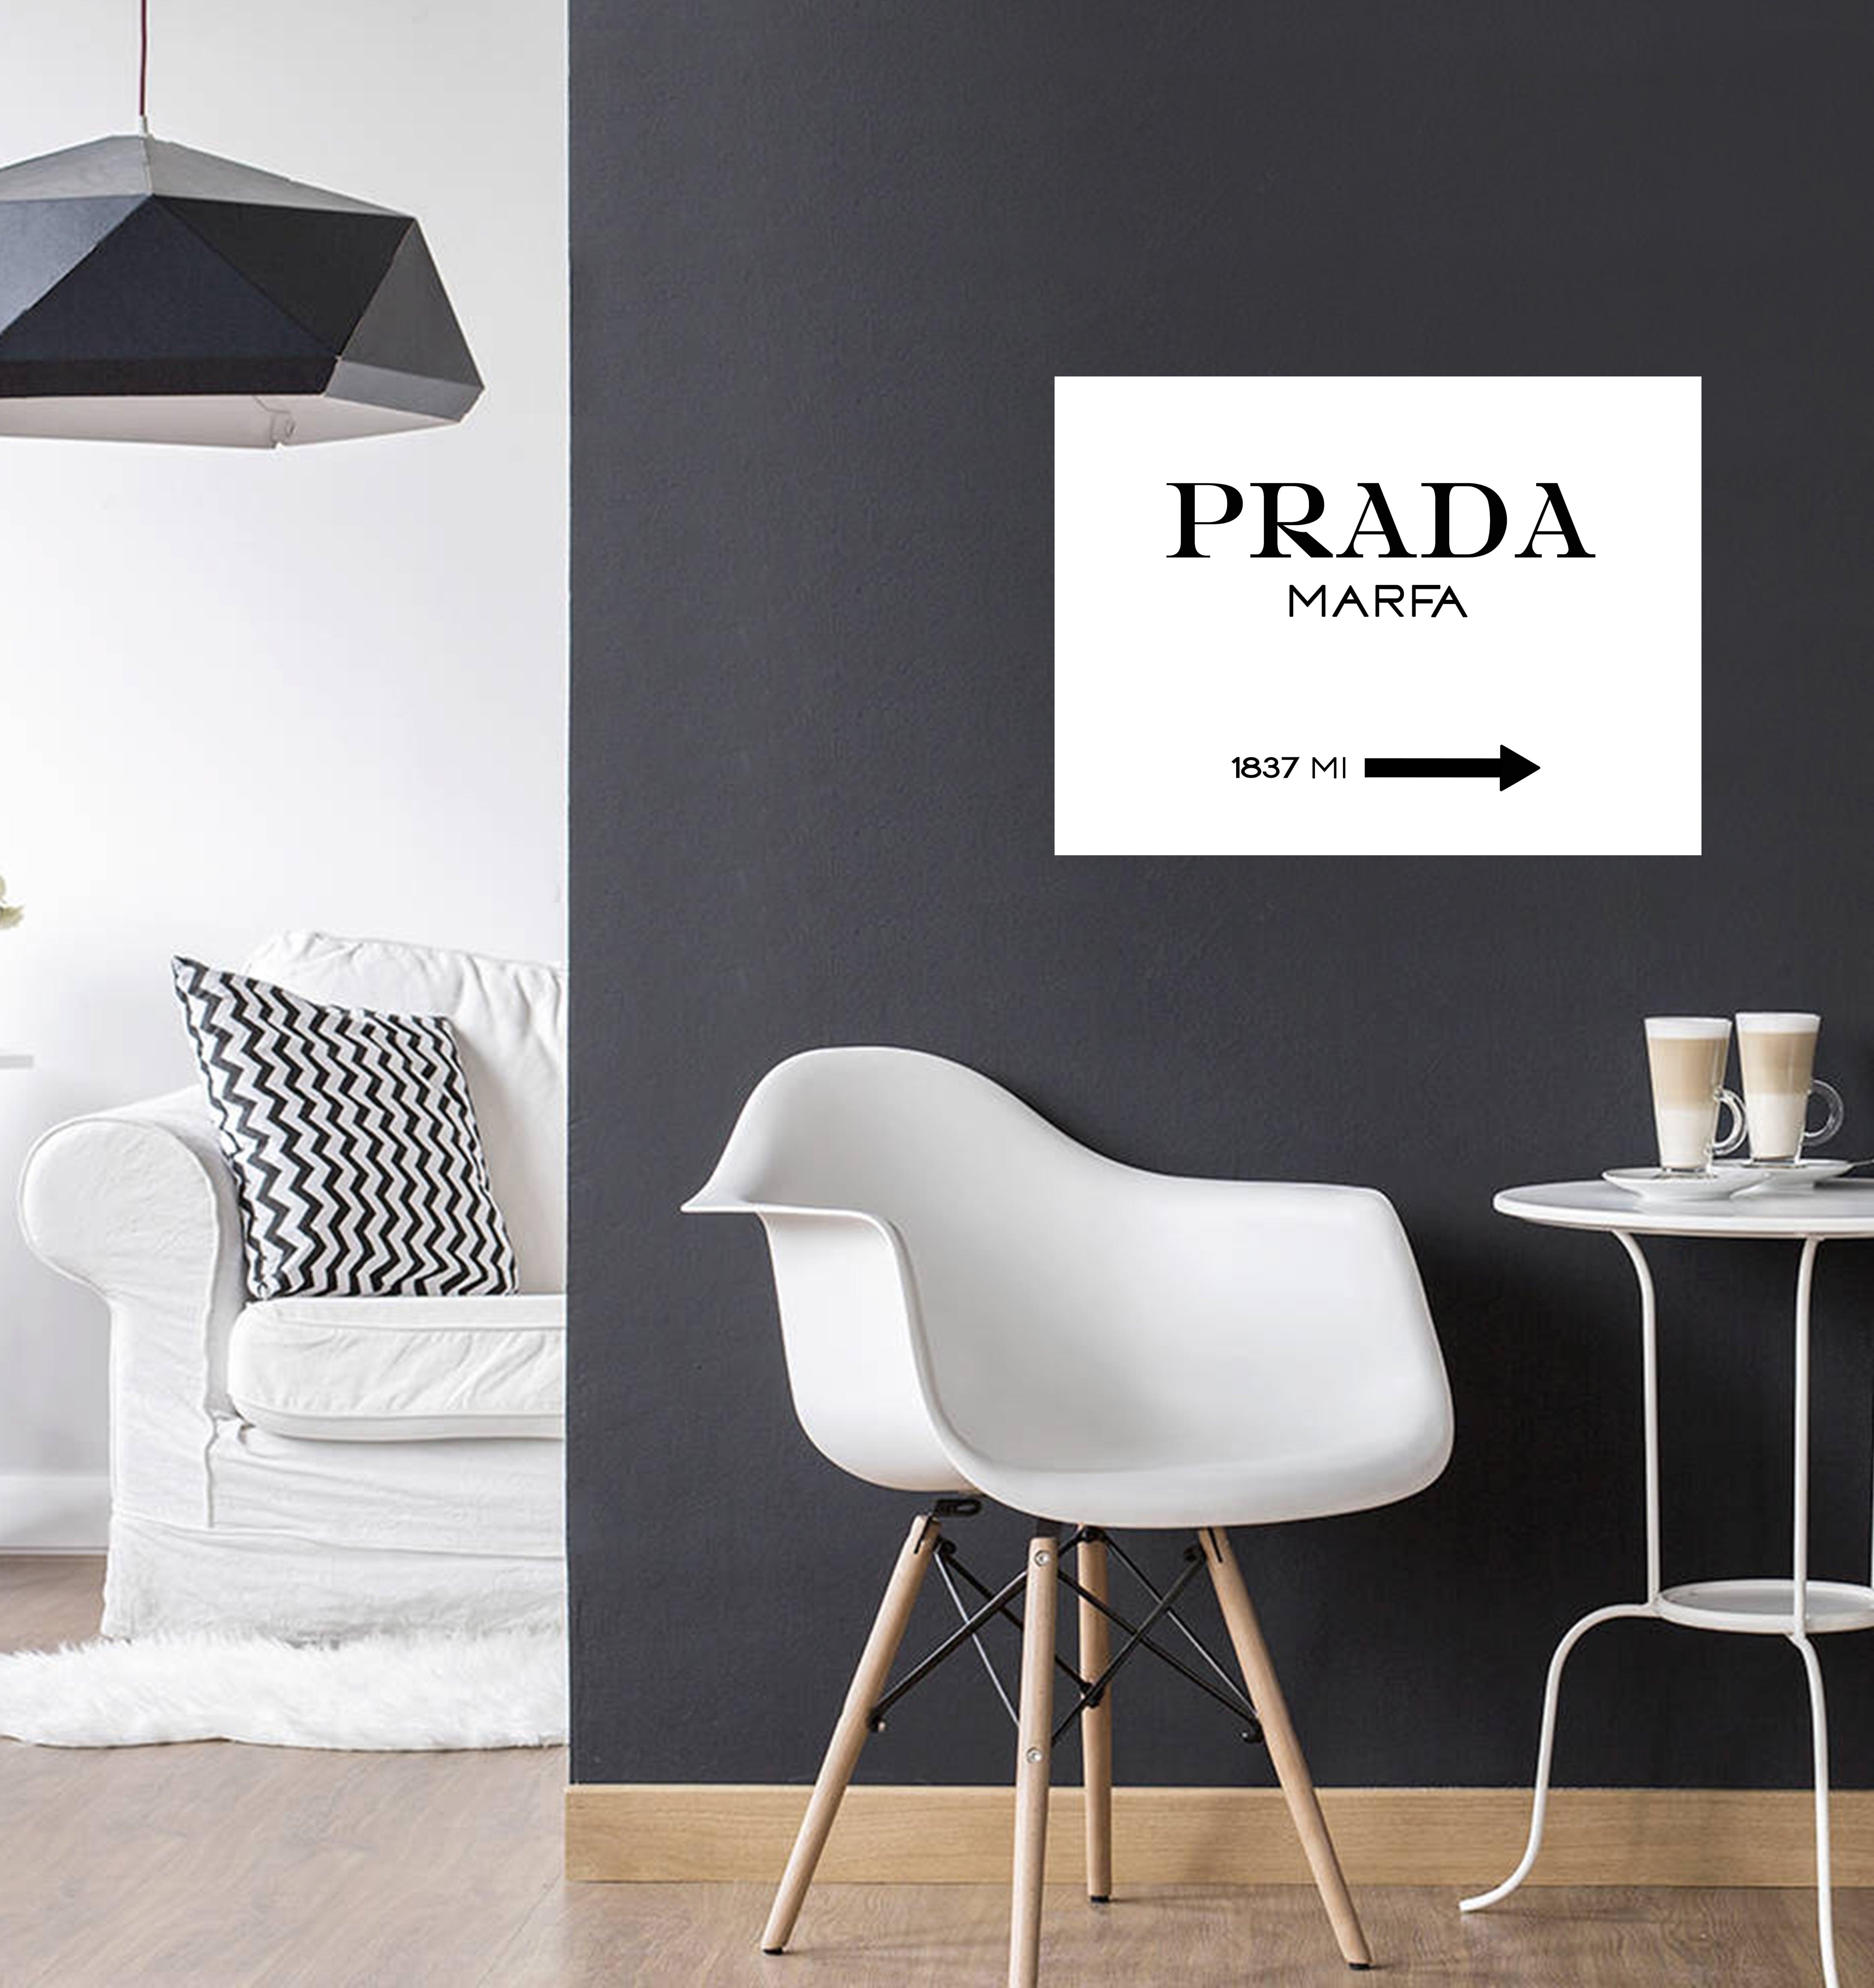 Prada marfa design aluminium frame for a modern wall decoration